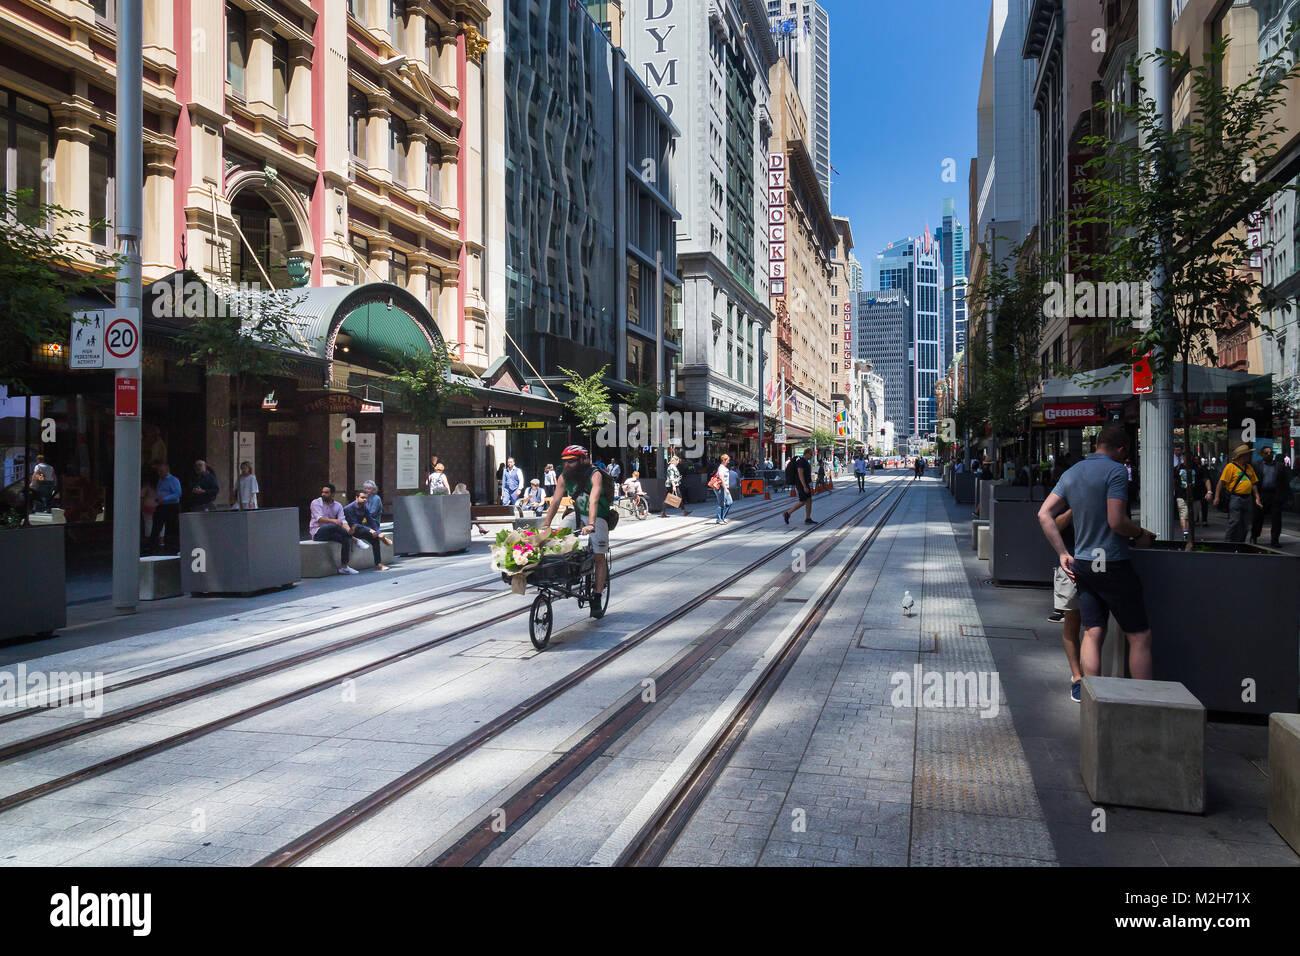 The new light railway system in progress, George Street, Sydney. - Stock Image